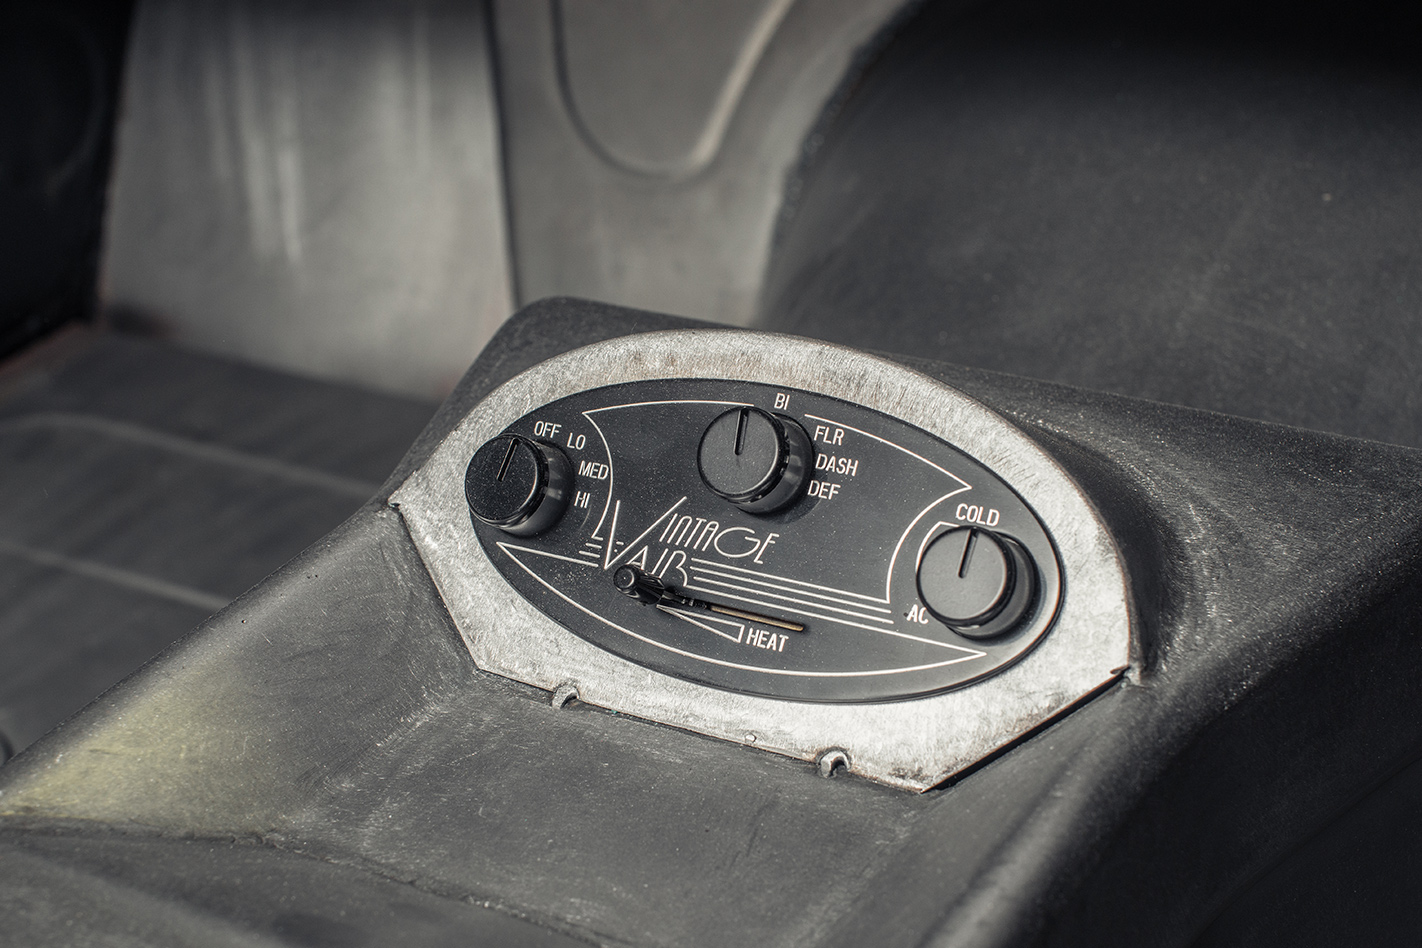 VG Valiant controls